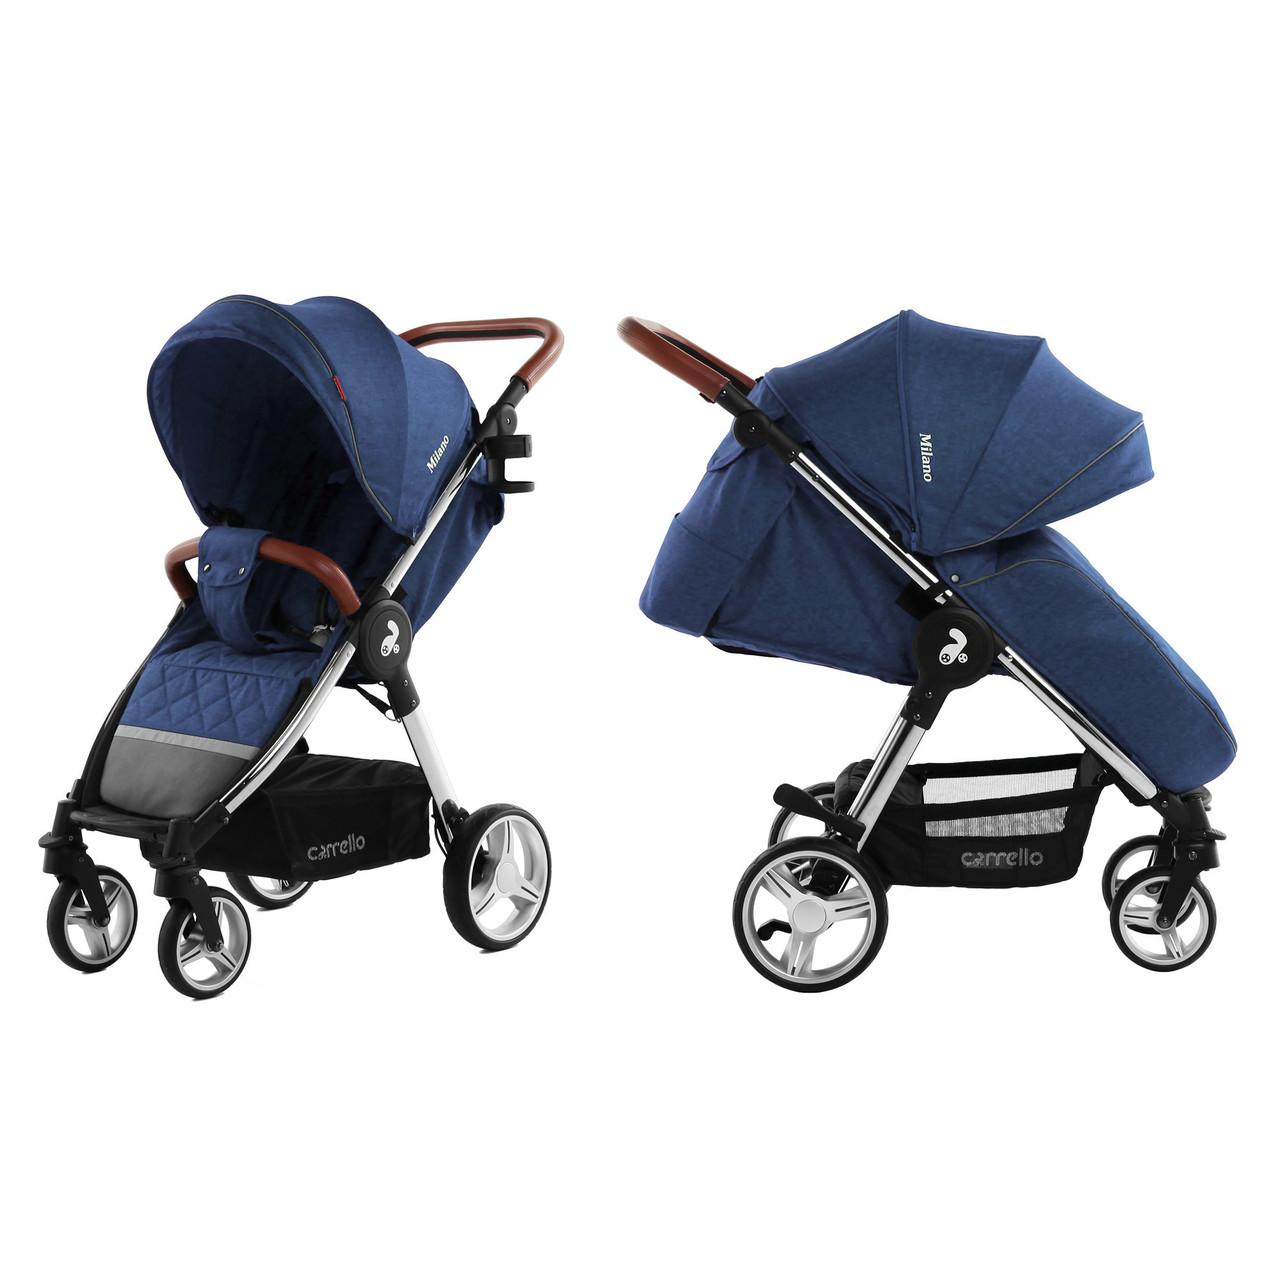 Коляска прогулочная CARRELLO Milano CRL-5501 Blue Velvet +дощовик